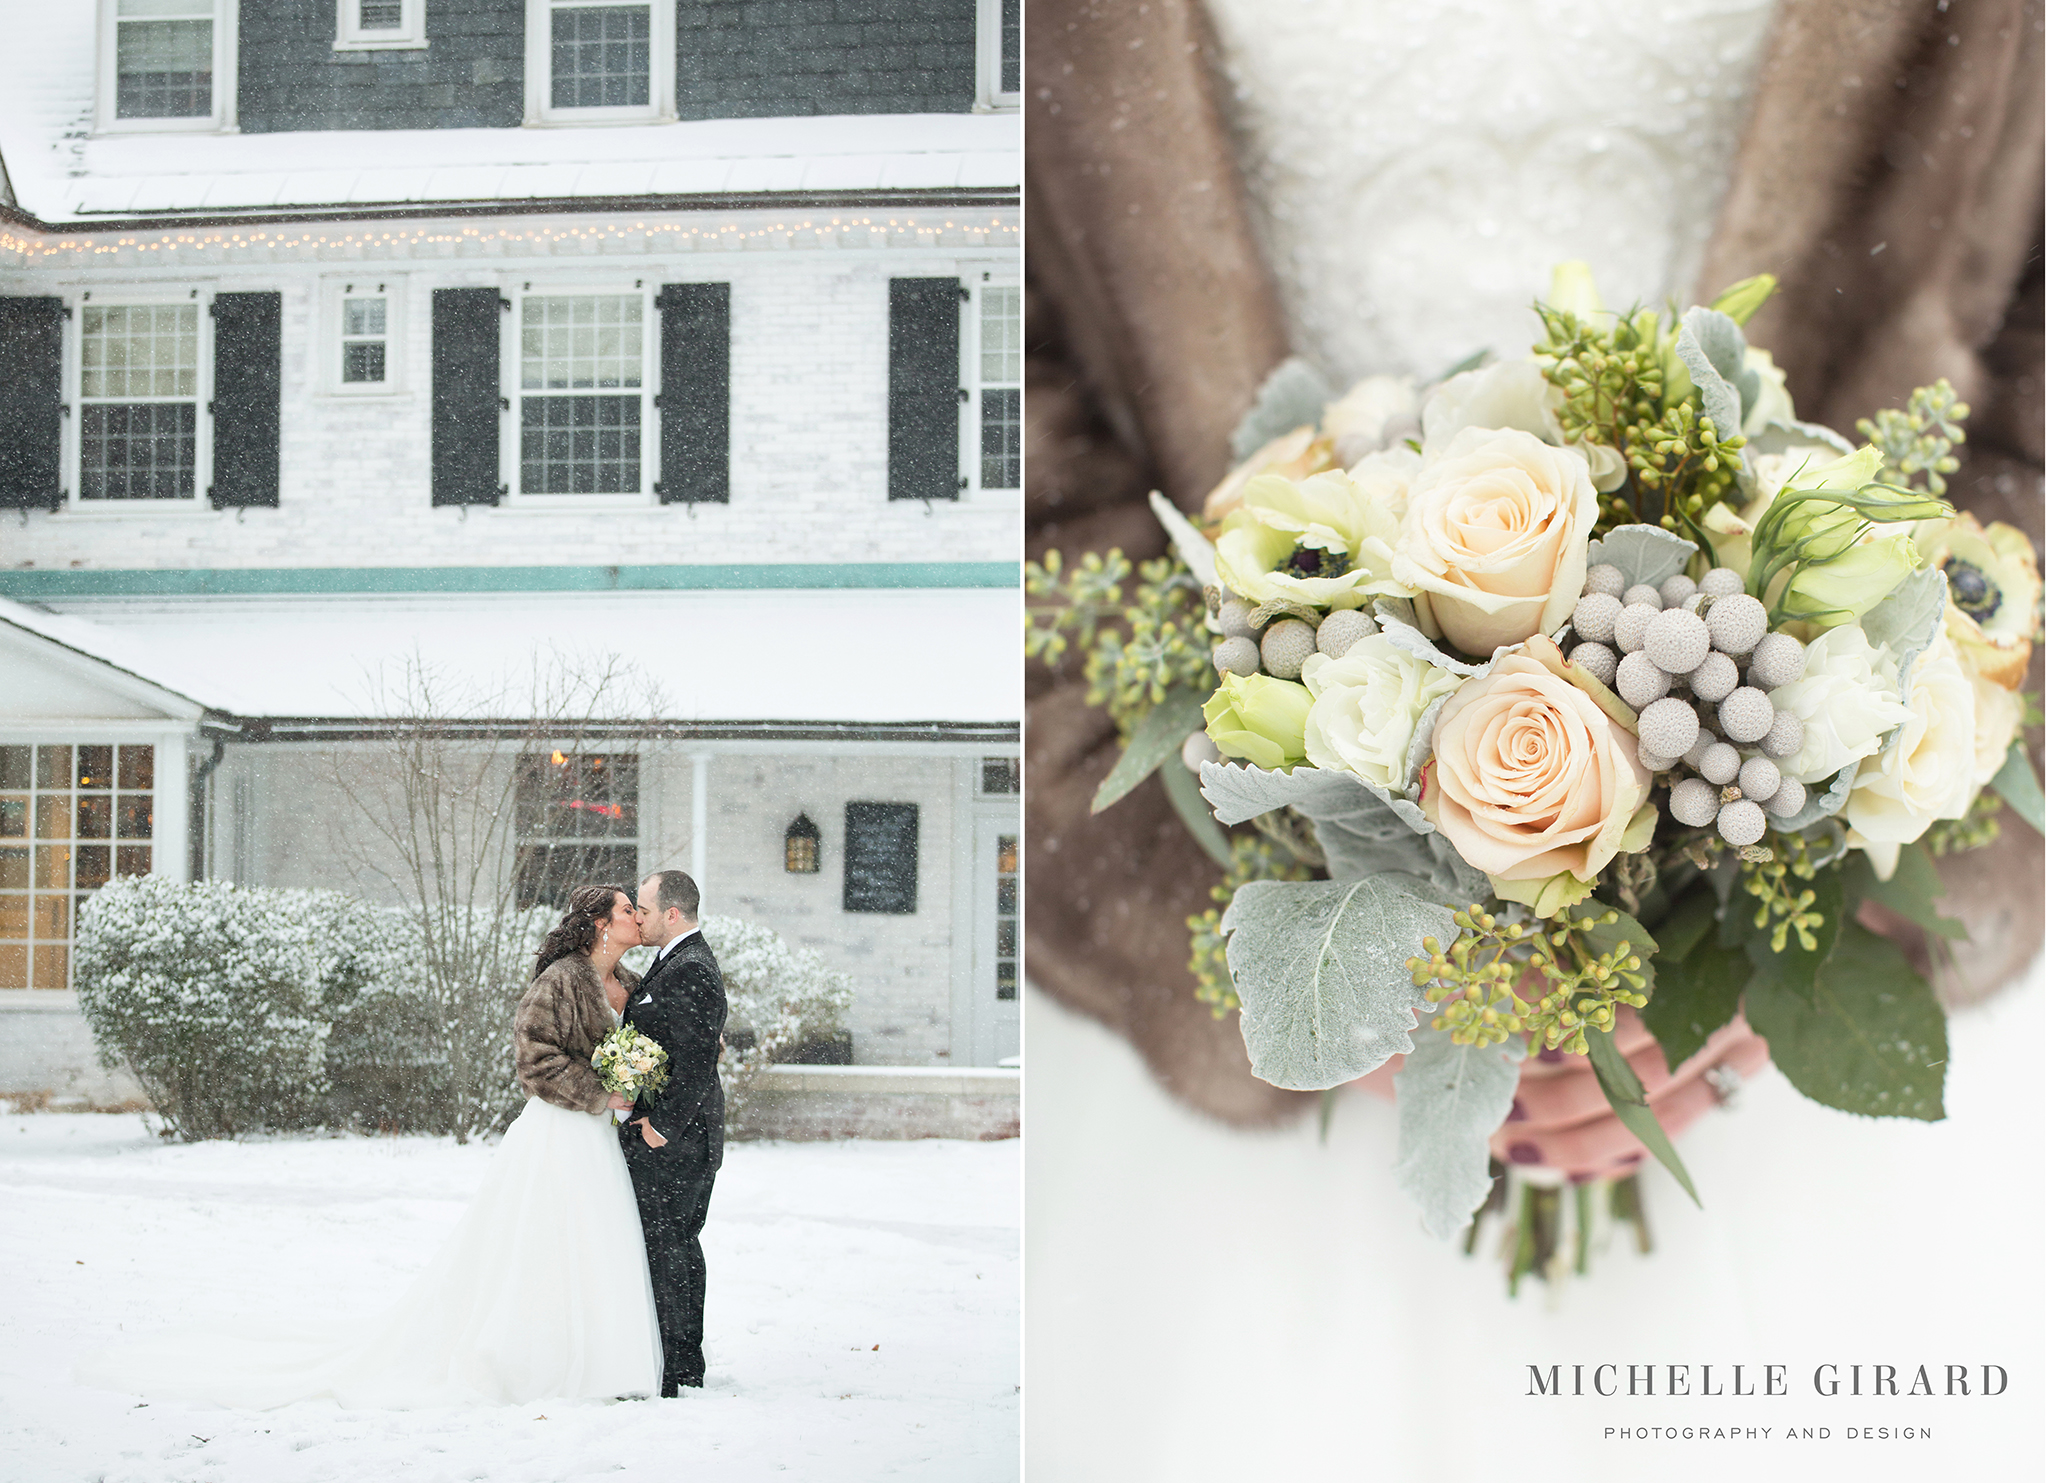 WinterWedding_LordJefferyInn_AmherstMA_MichelleGirardPhotography04.jpg